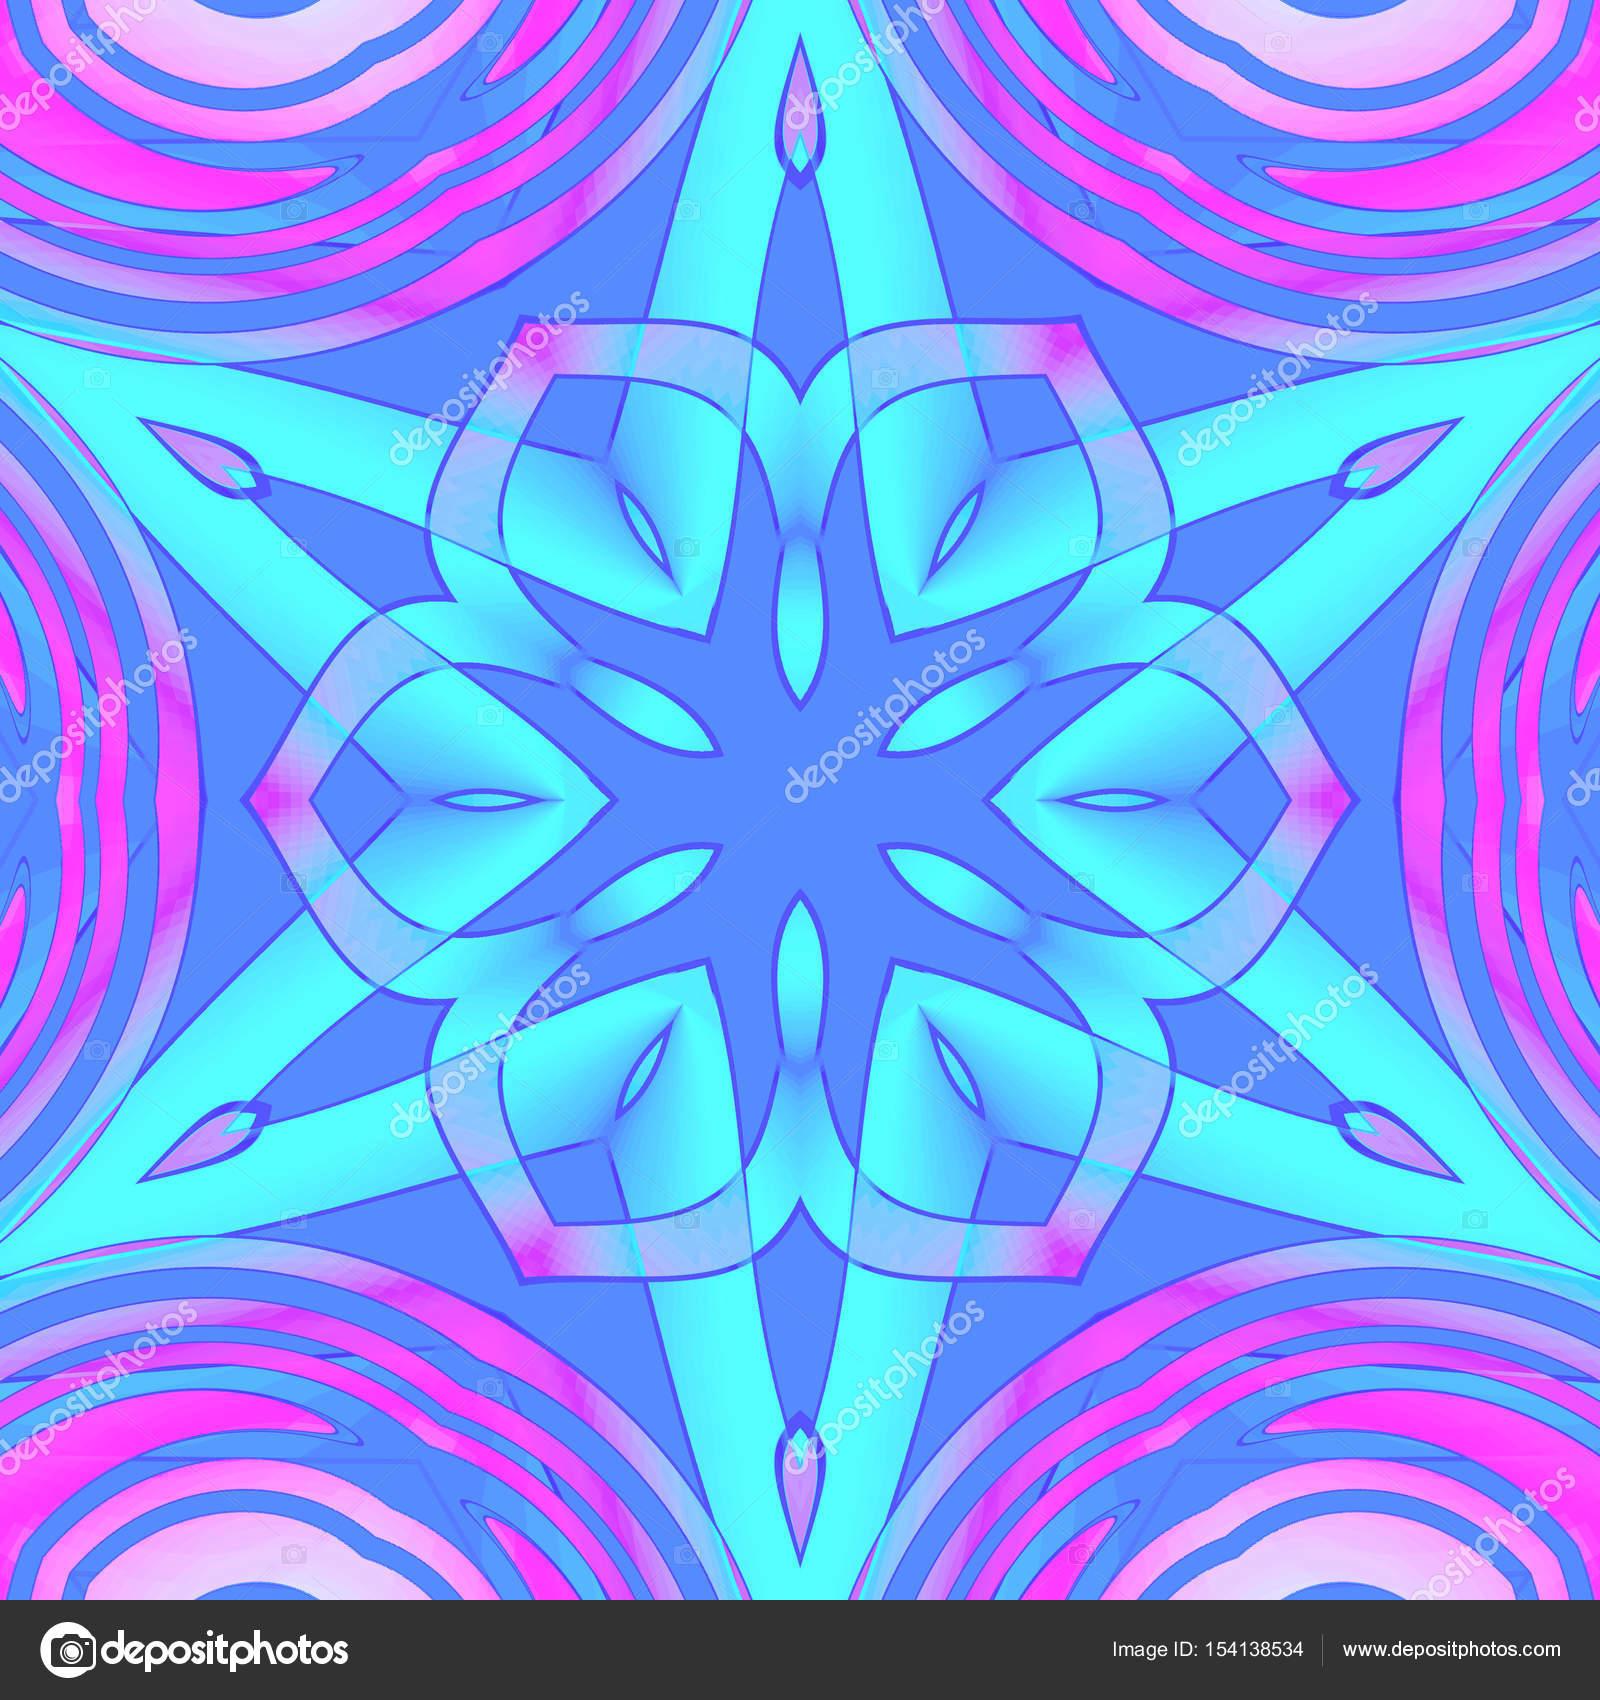 Regelmäßige Zentriert Sterne Ornament Türkis Lila Rosa Violett